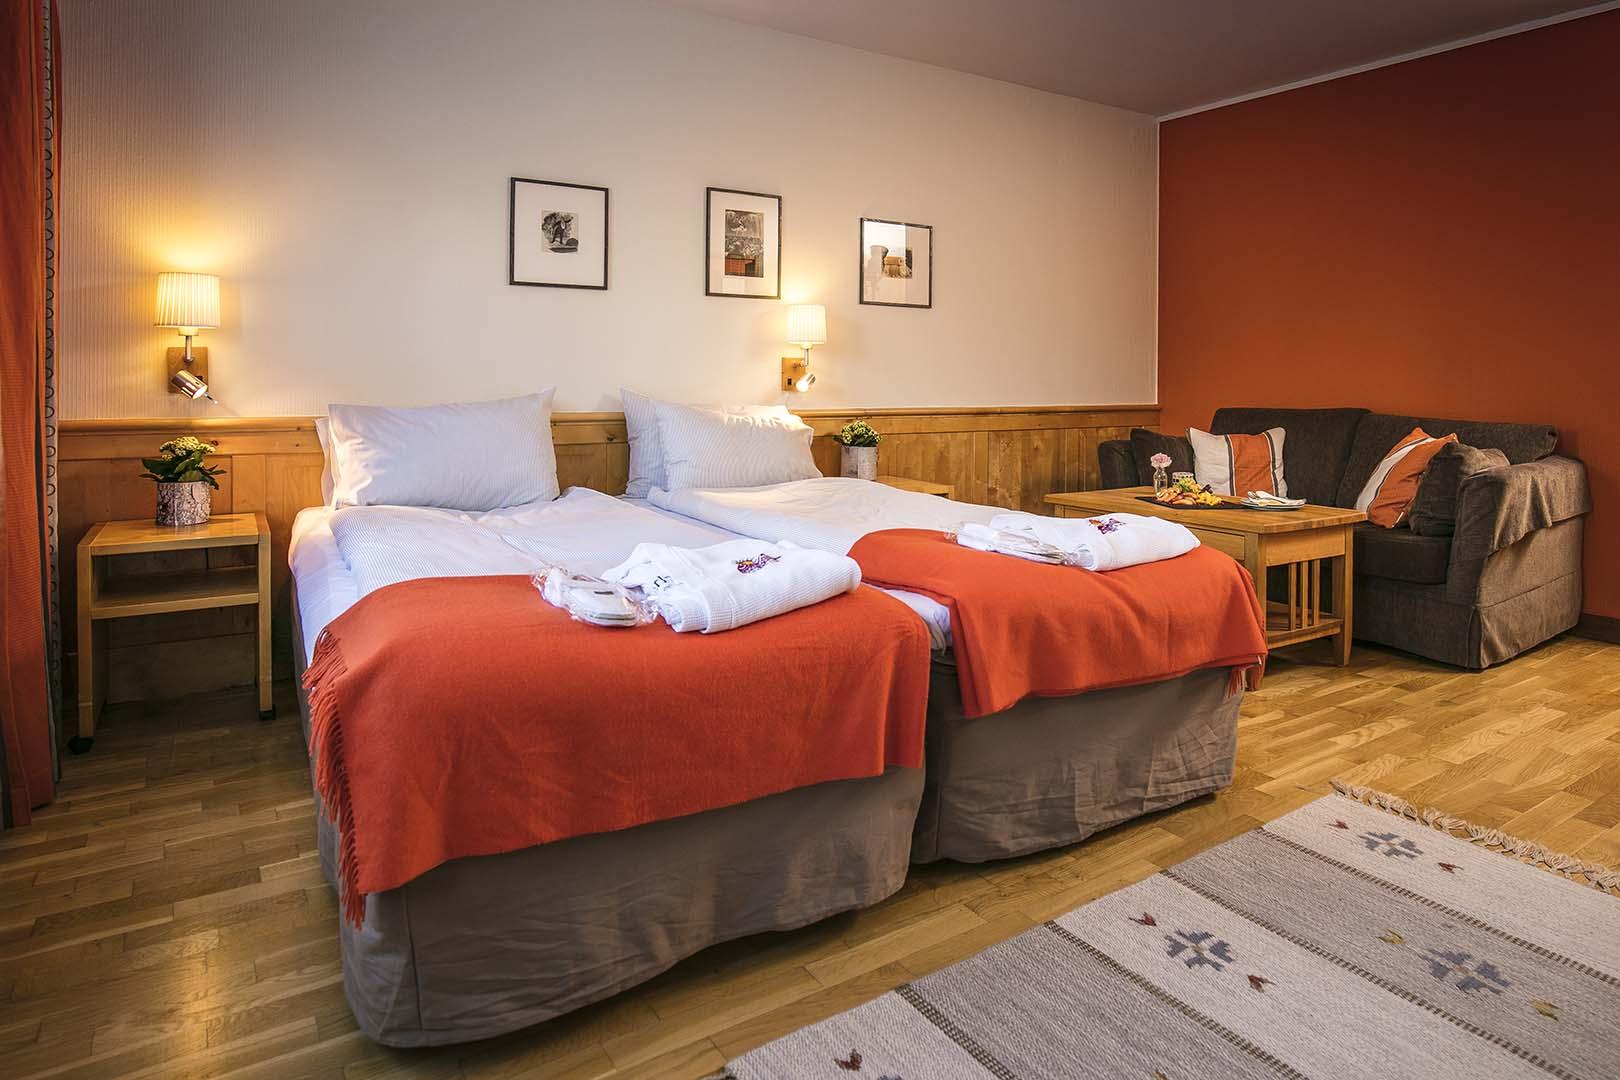 Storhogna Högfjällshotell & Spa: A different kind of spa experience